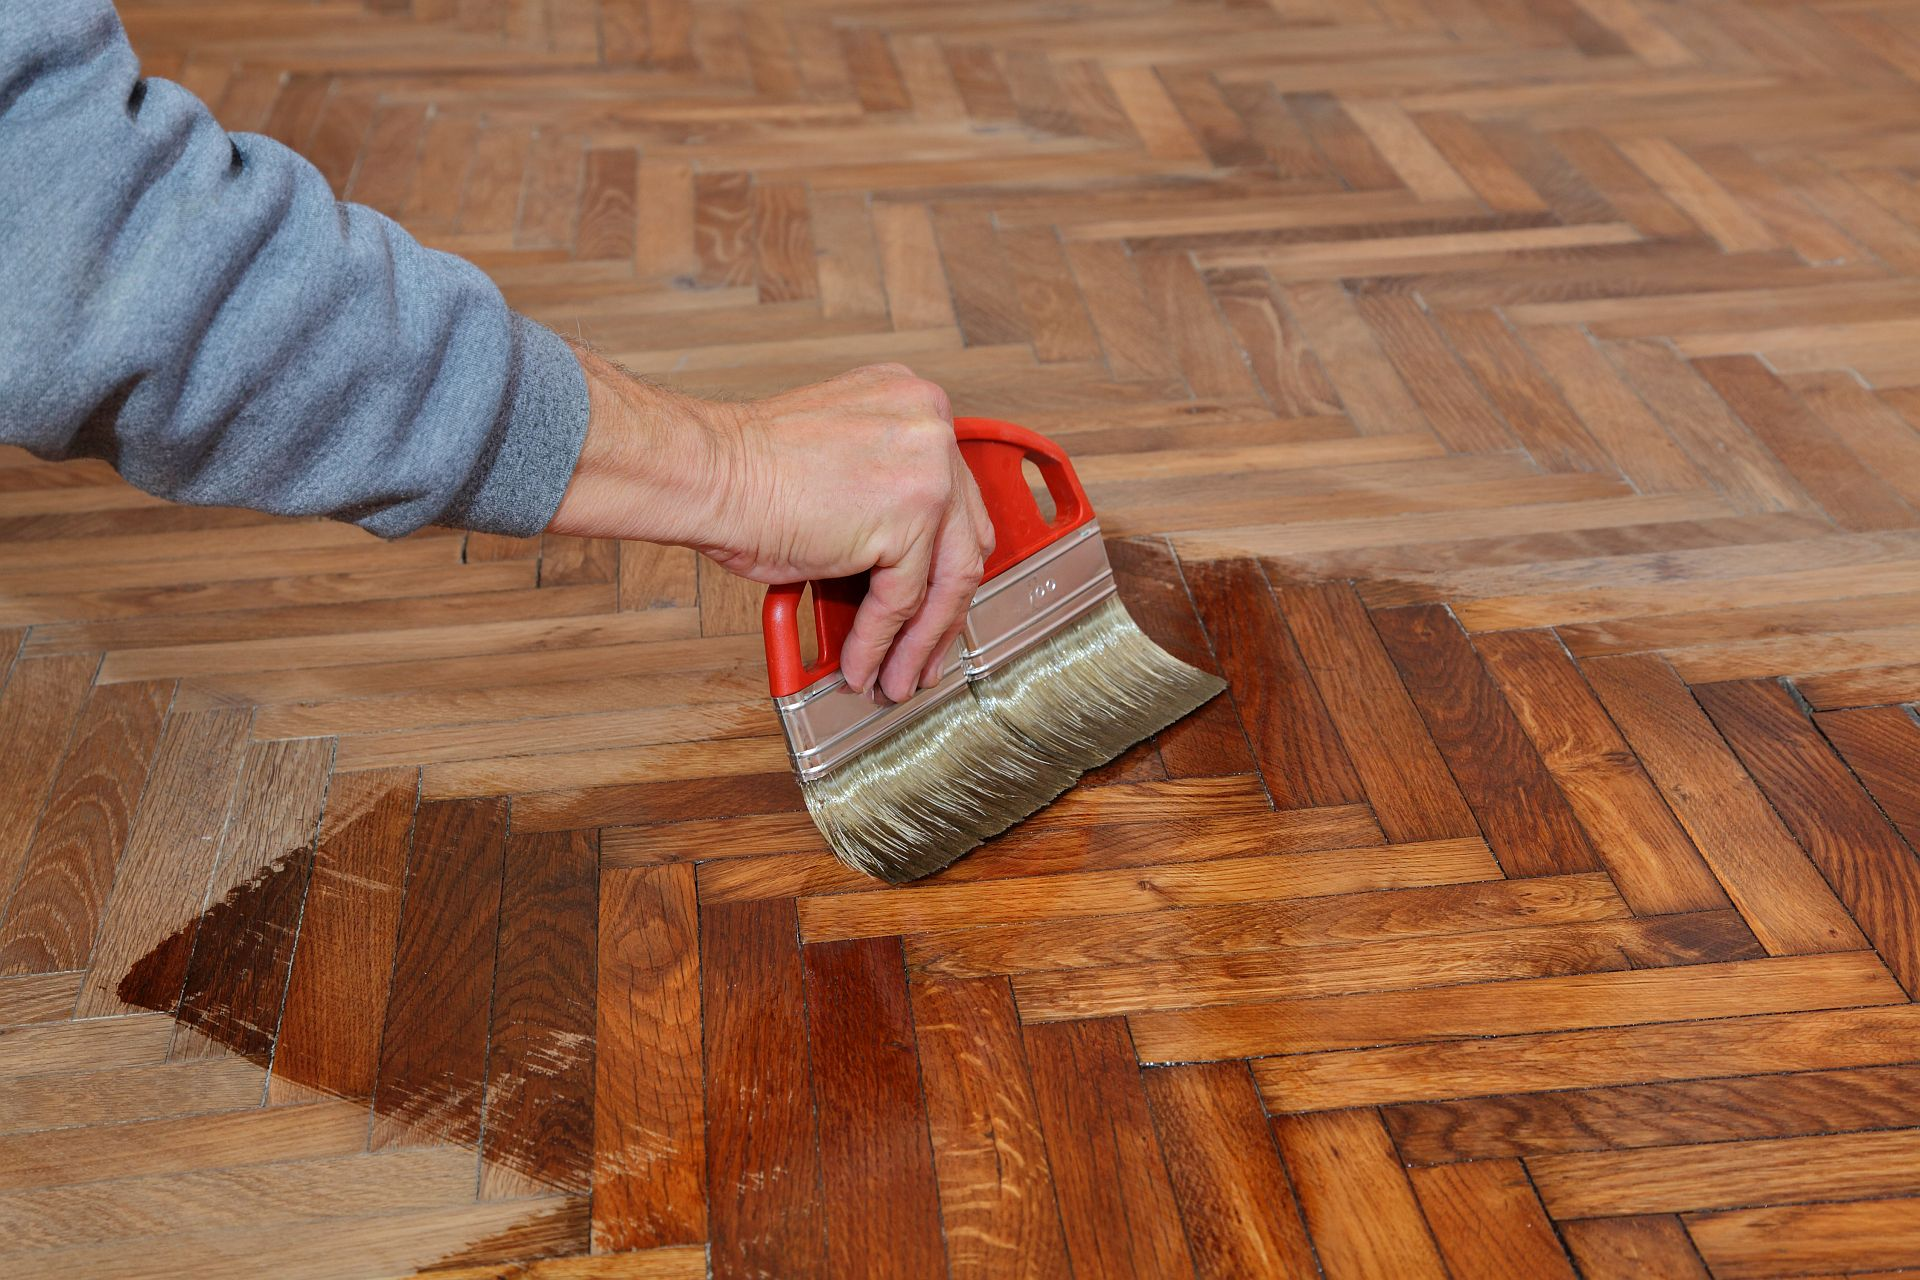 Holzfußboden Spachteln ~ Holzboden spachteln den holzfuboden gut subern with holzboden